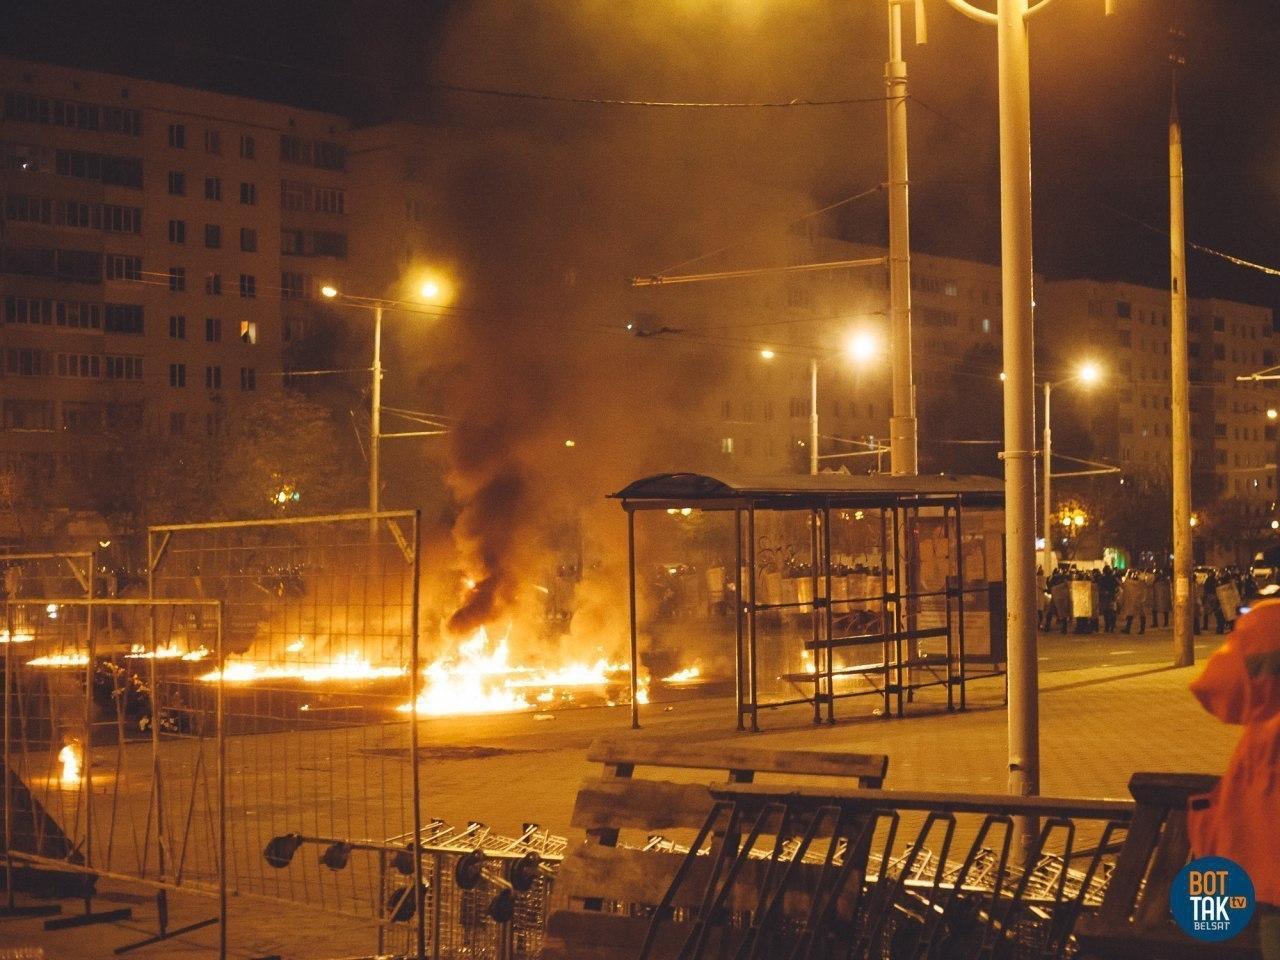 Wie kam es zur Rebellion gegen die Diktatur in Belarus